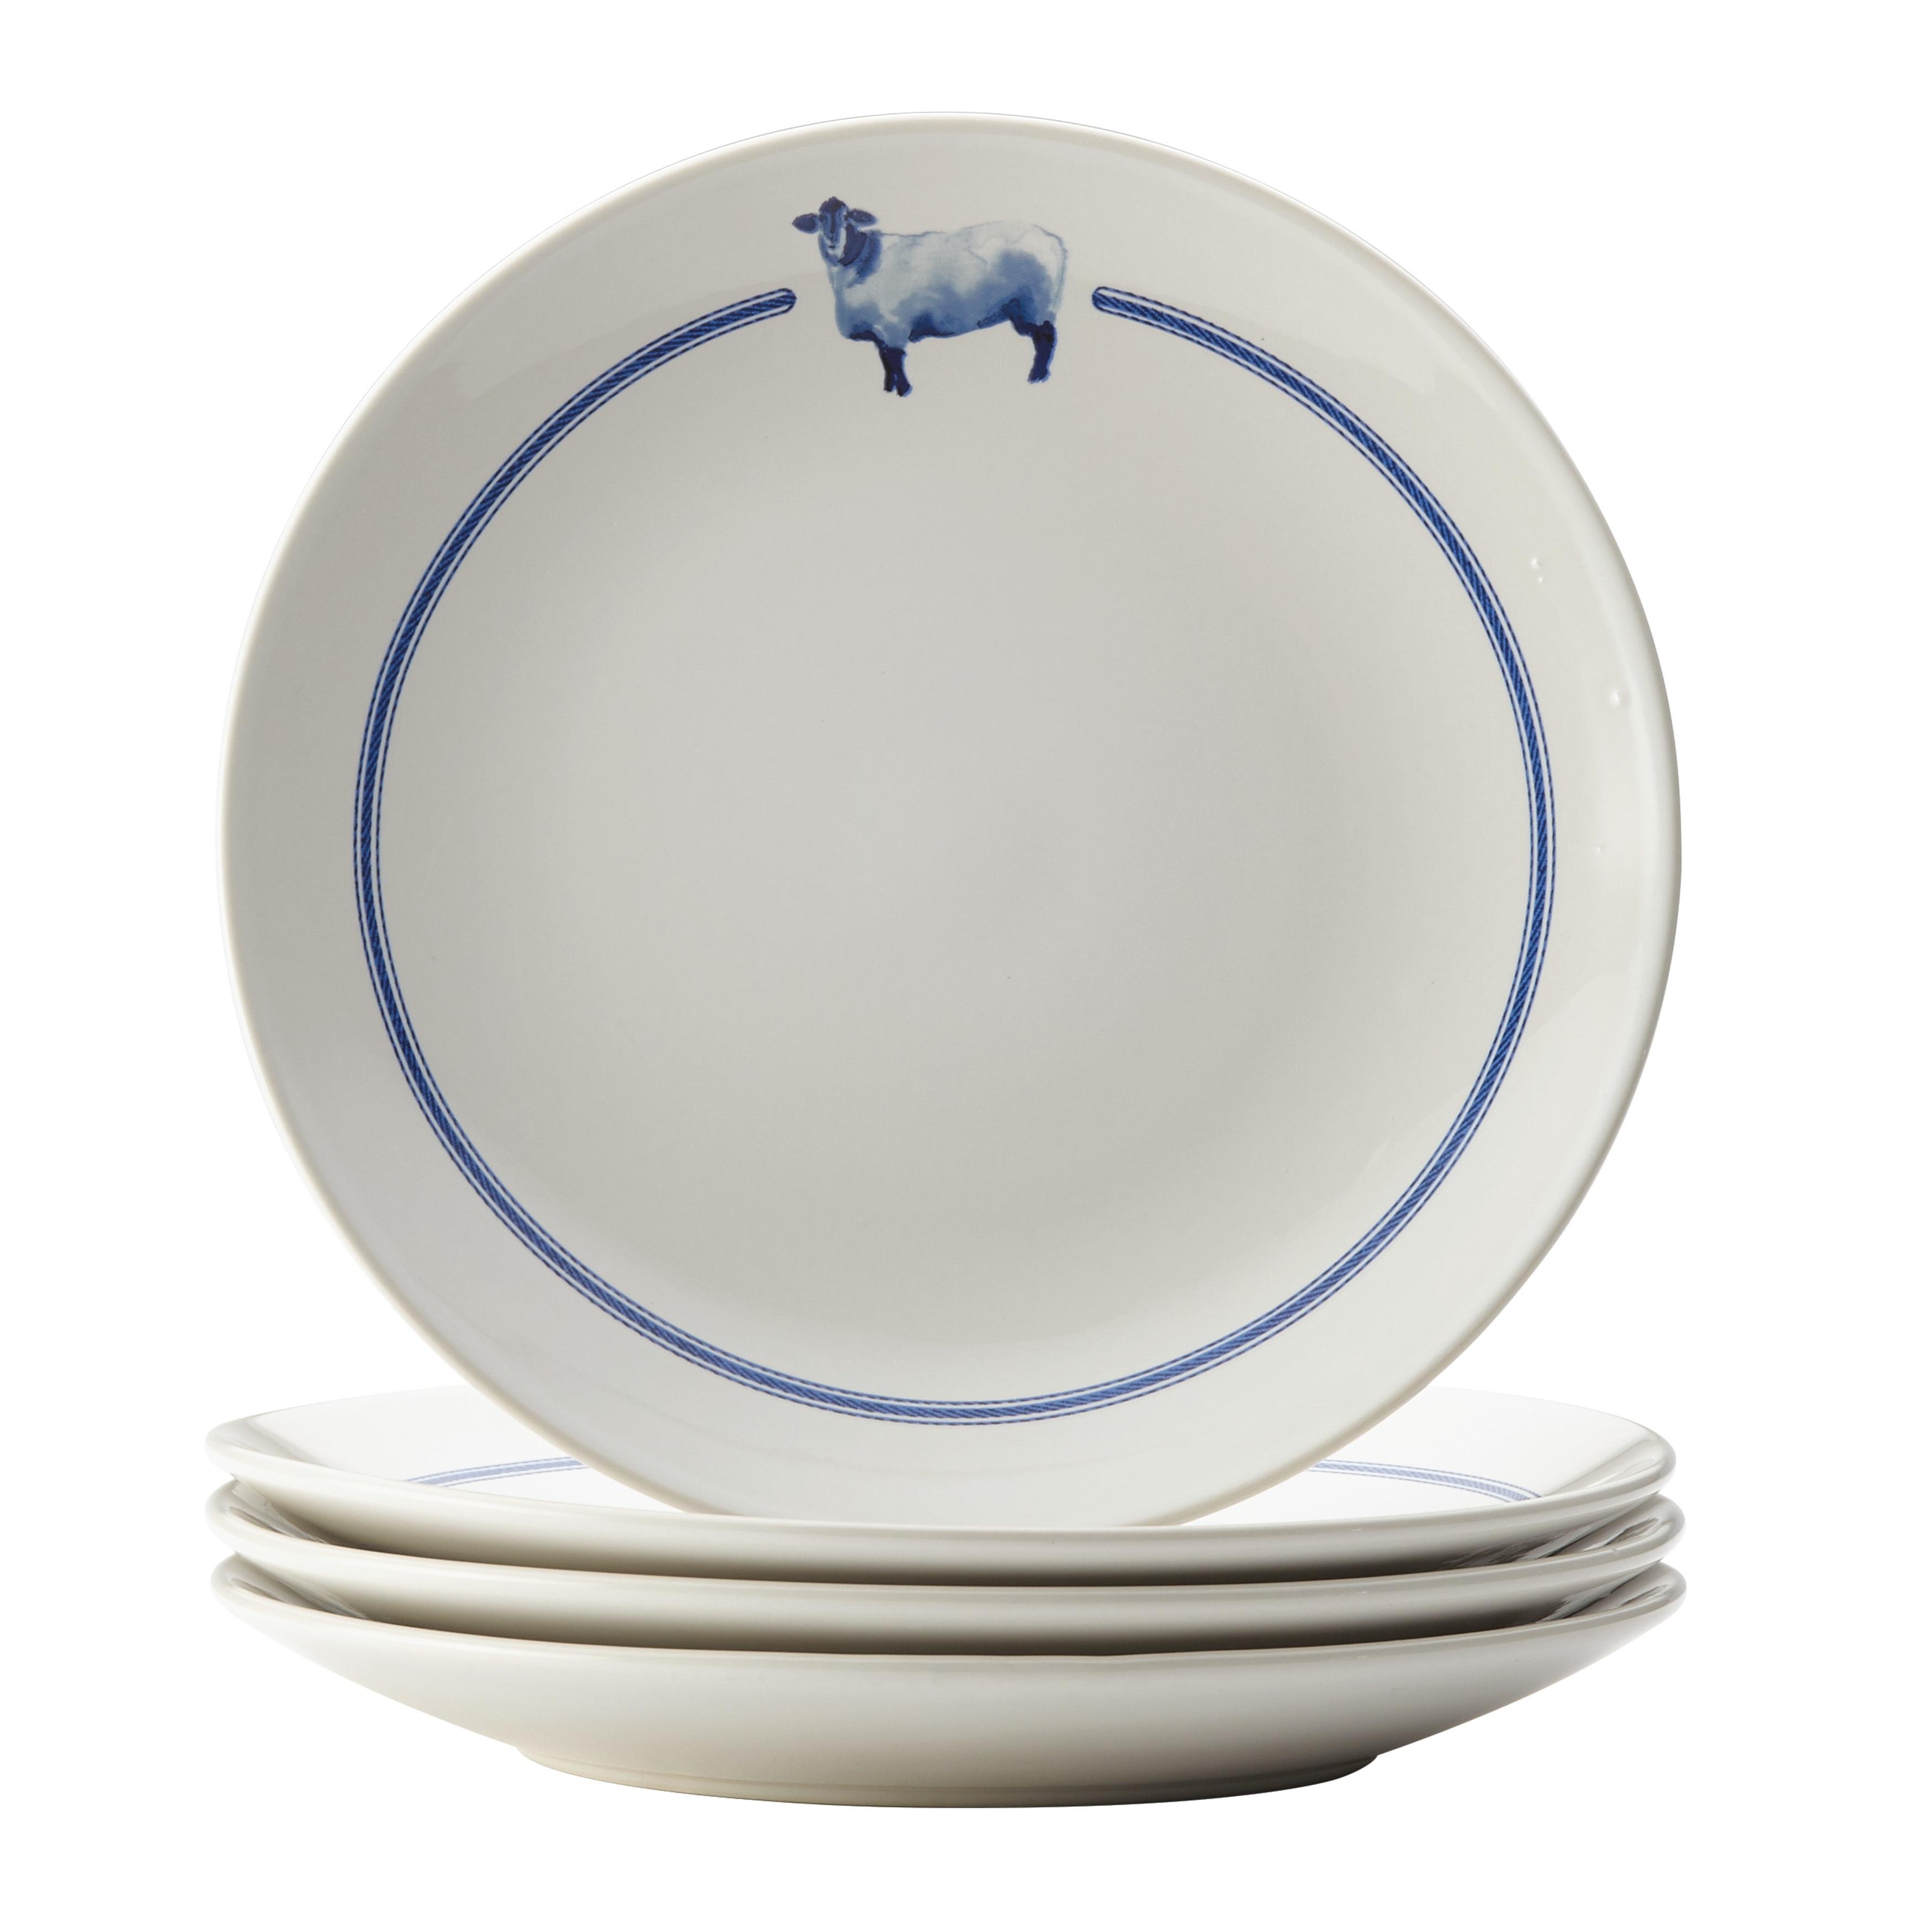 Paula Deen Country Barnyard Stoneware Dinnerware 16-Piece Set - Free Shipping Today - Overstock - 23876598  sc 1 st  Overstock.com & Paula Deen Country Barnyard Stoneware Dinnerware 16-Piece Set - Free ...